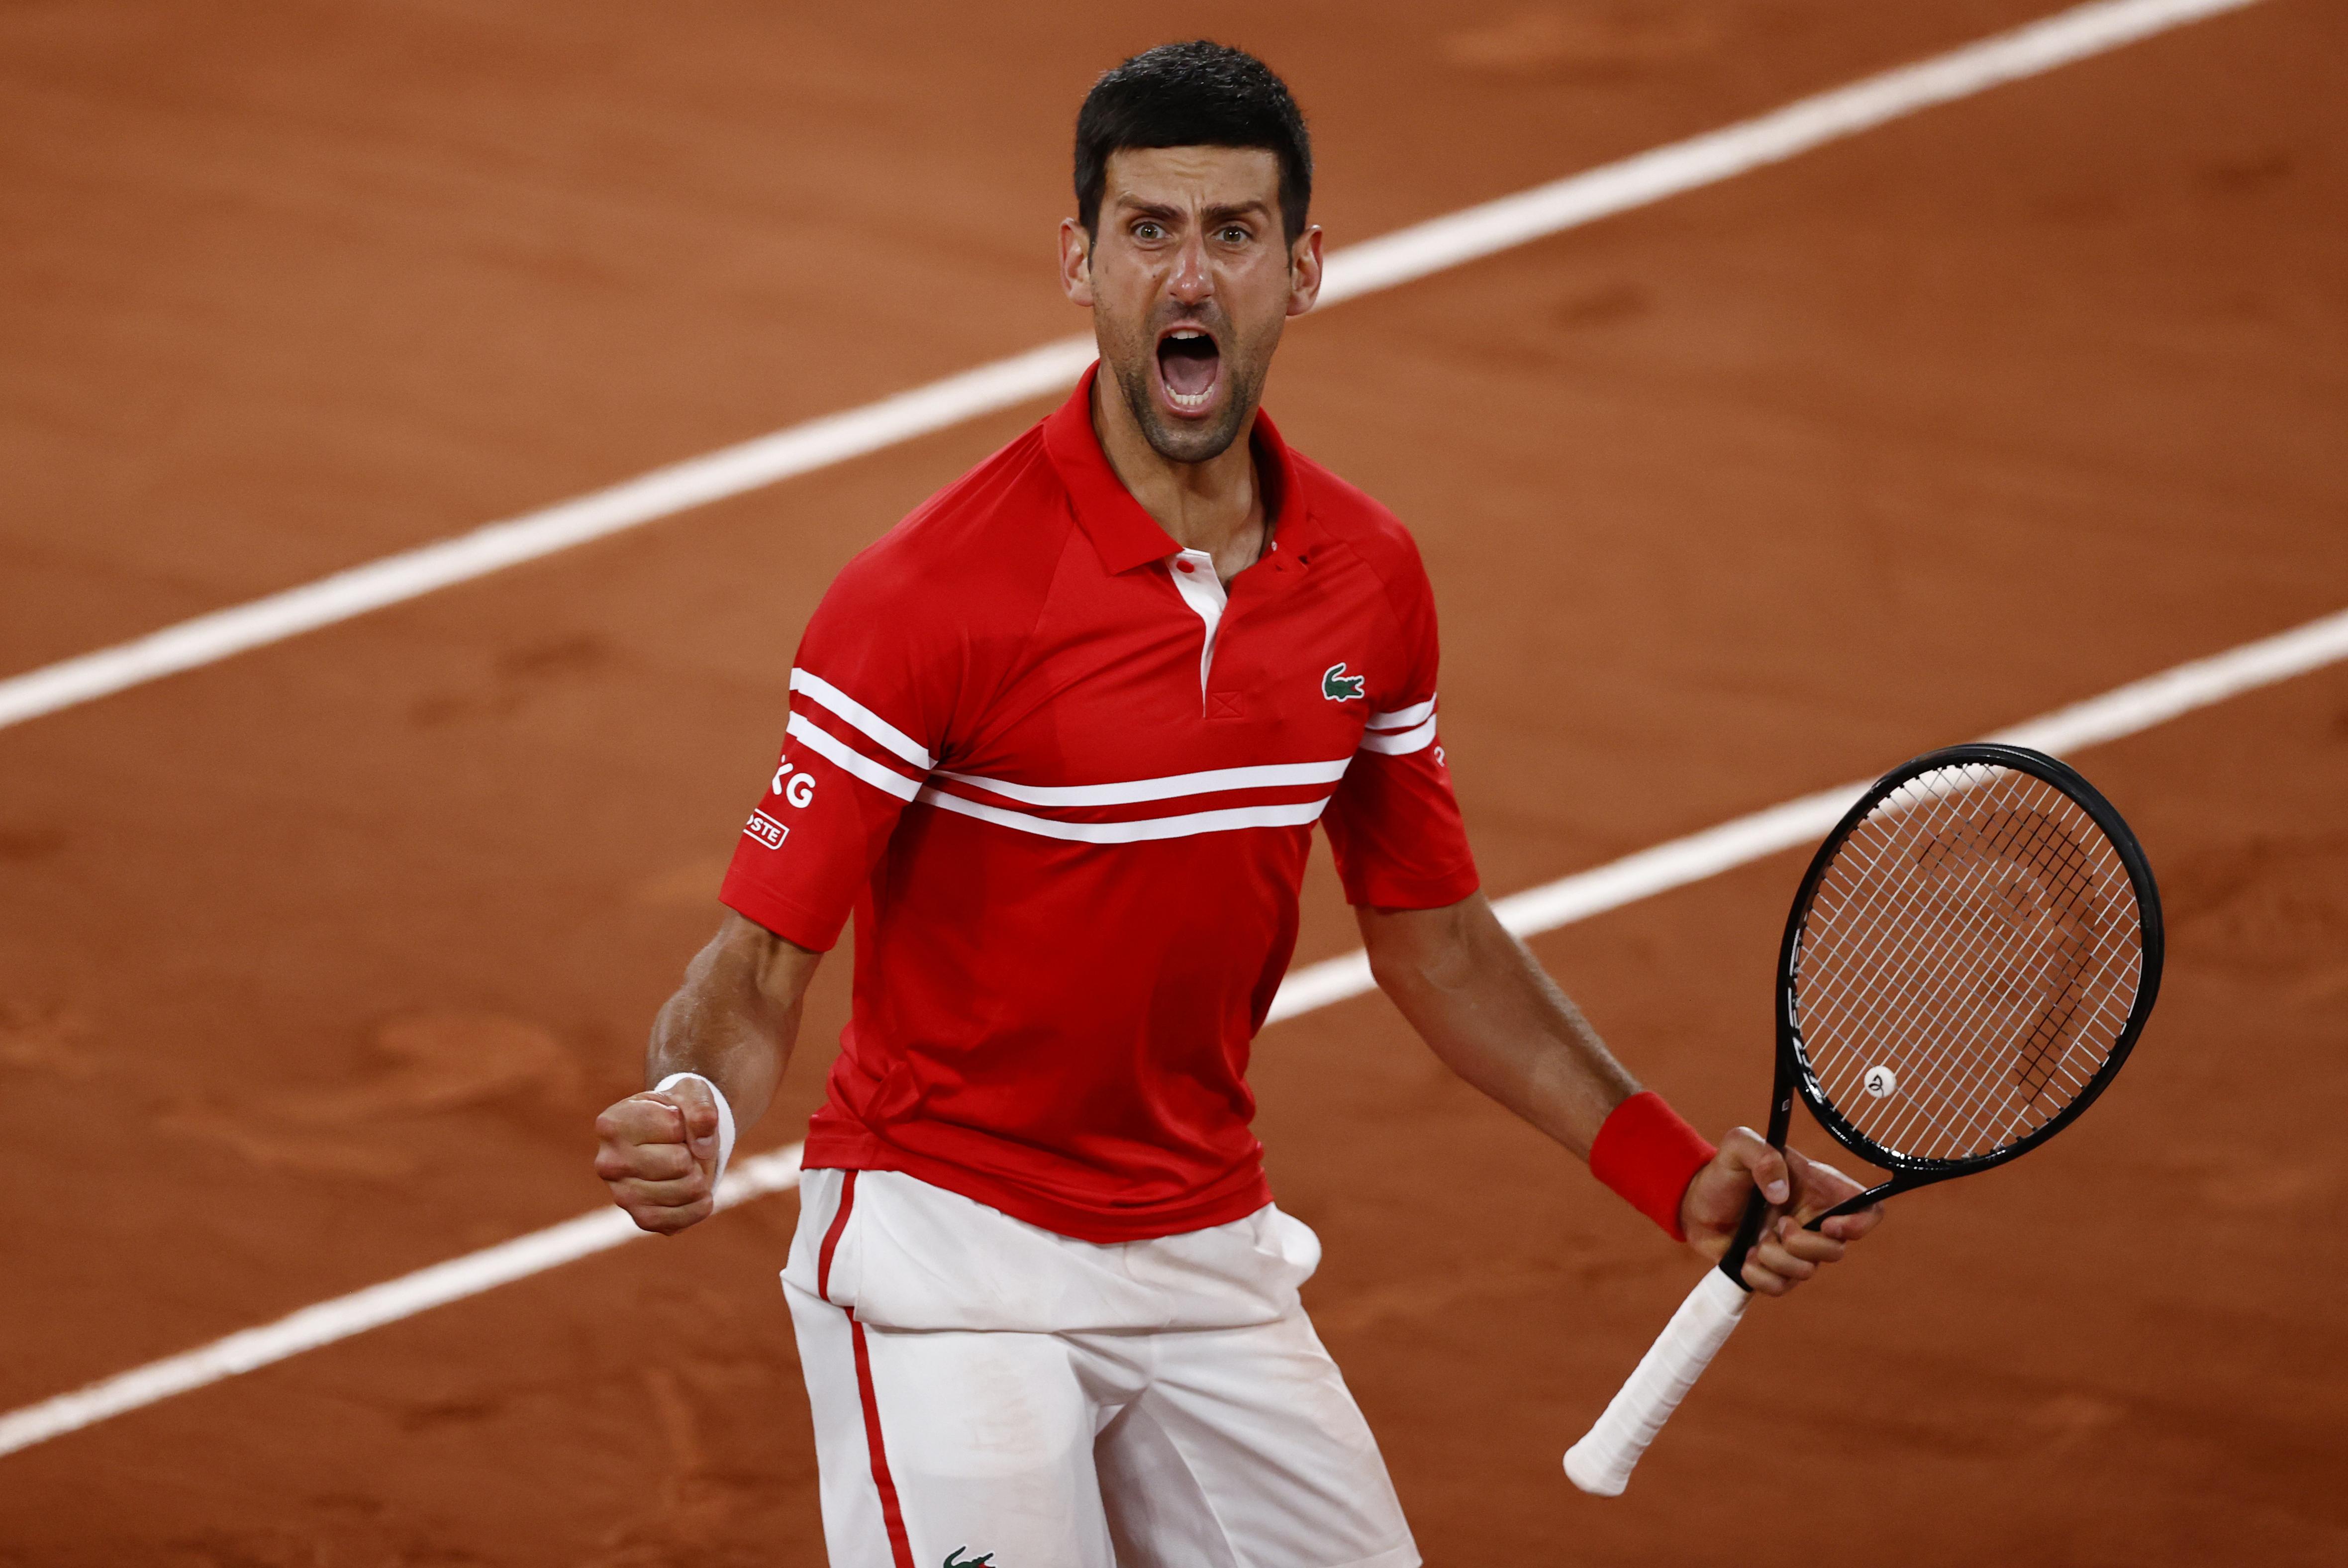 Tennis - French Open - Roland Garros, Paris, France - June 9, 2021  Serbia's Novak Djokovic celebrates winning his quarter final match against Italy's Matteo Berrettini REUTERS/Christian Hartmann